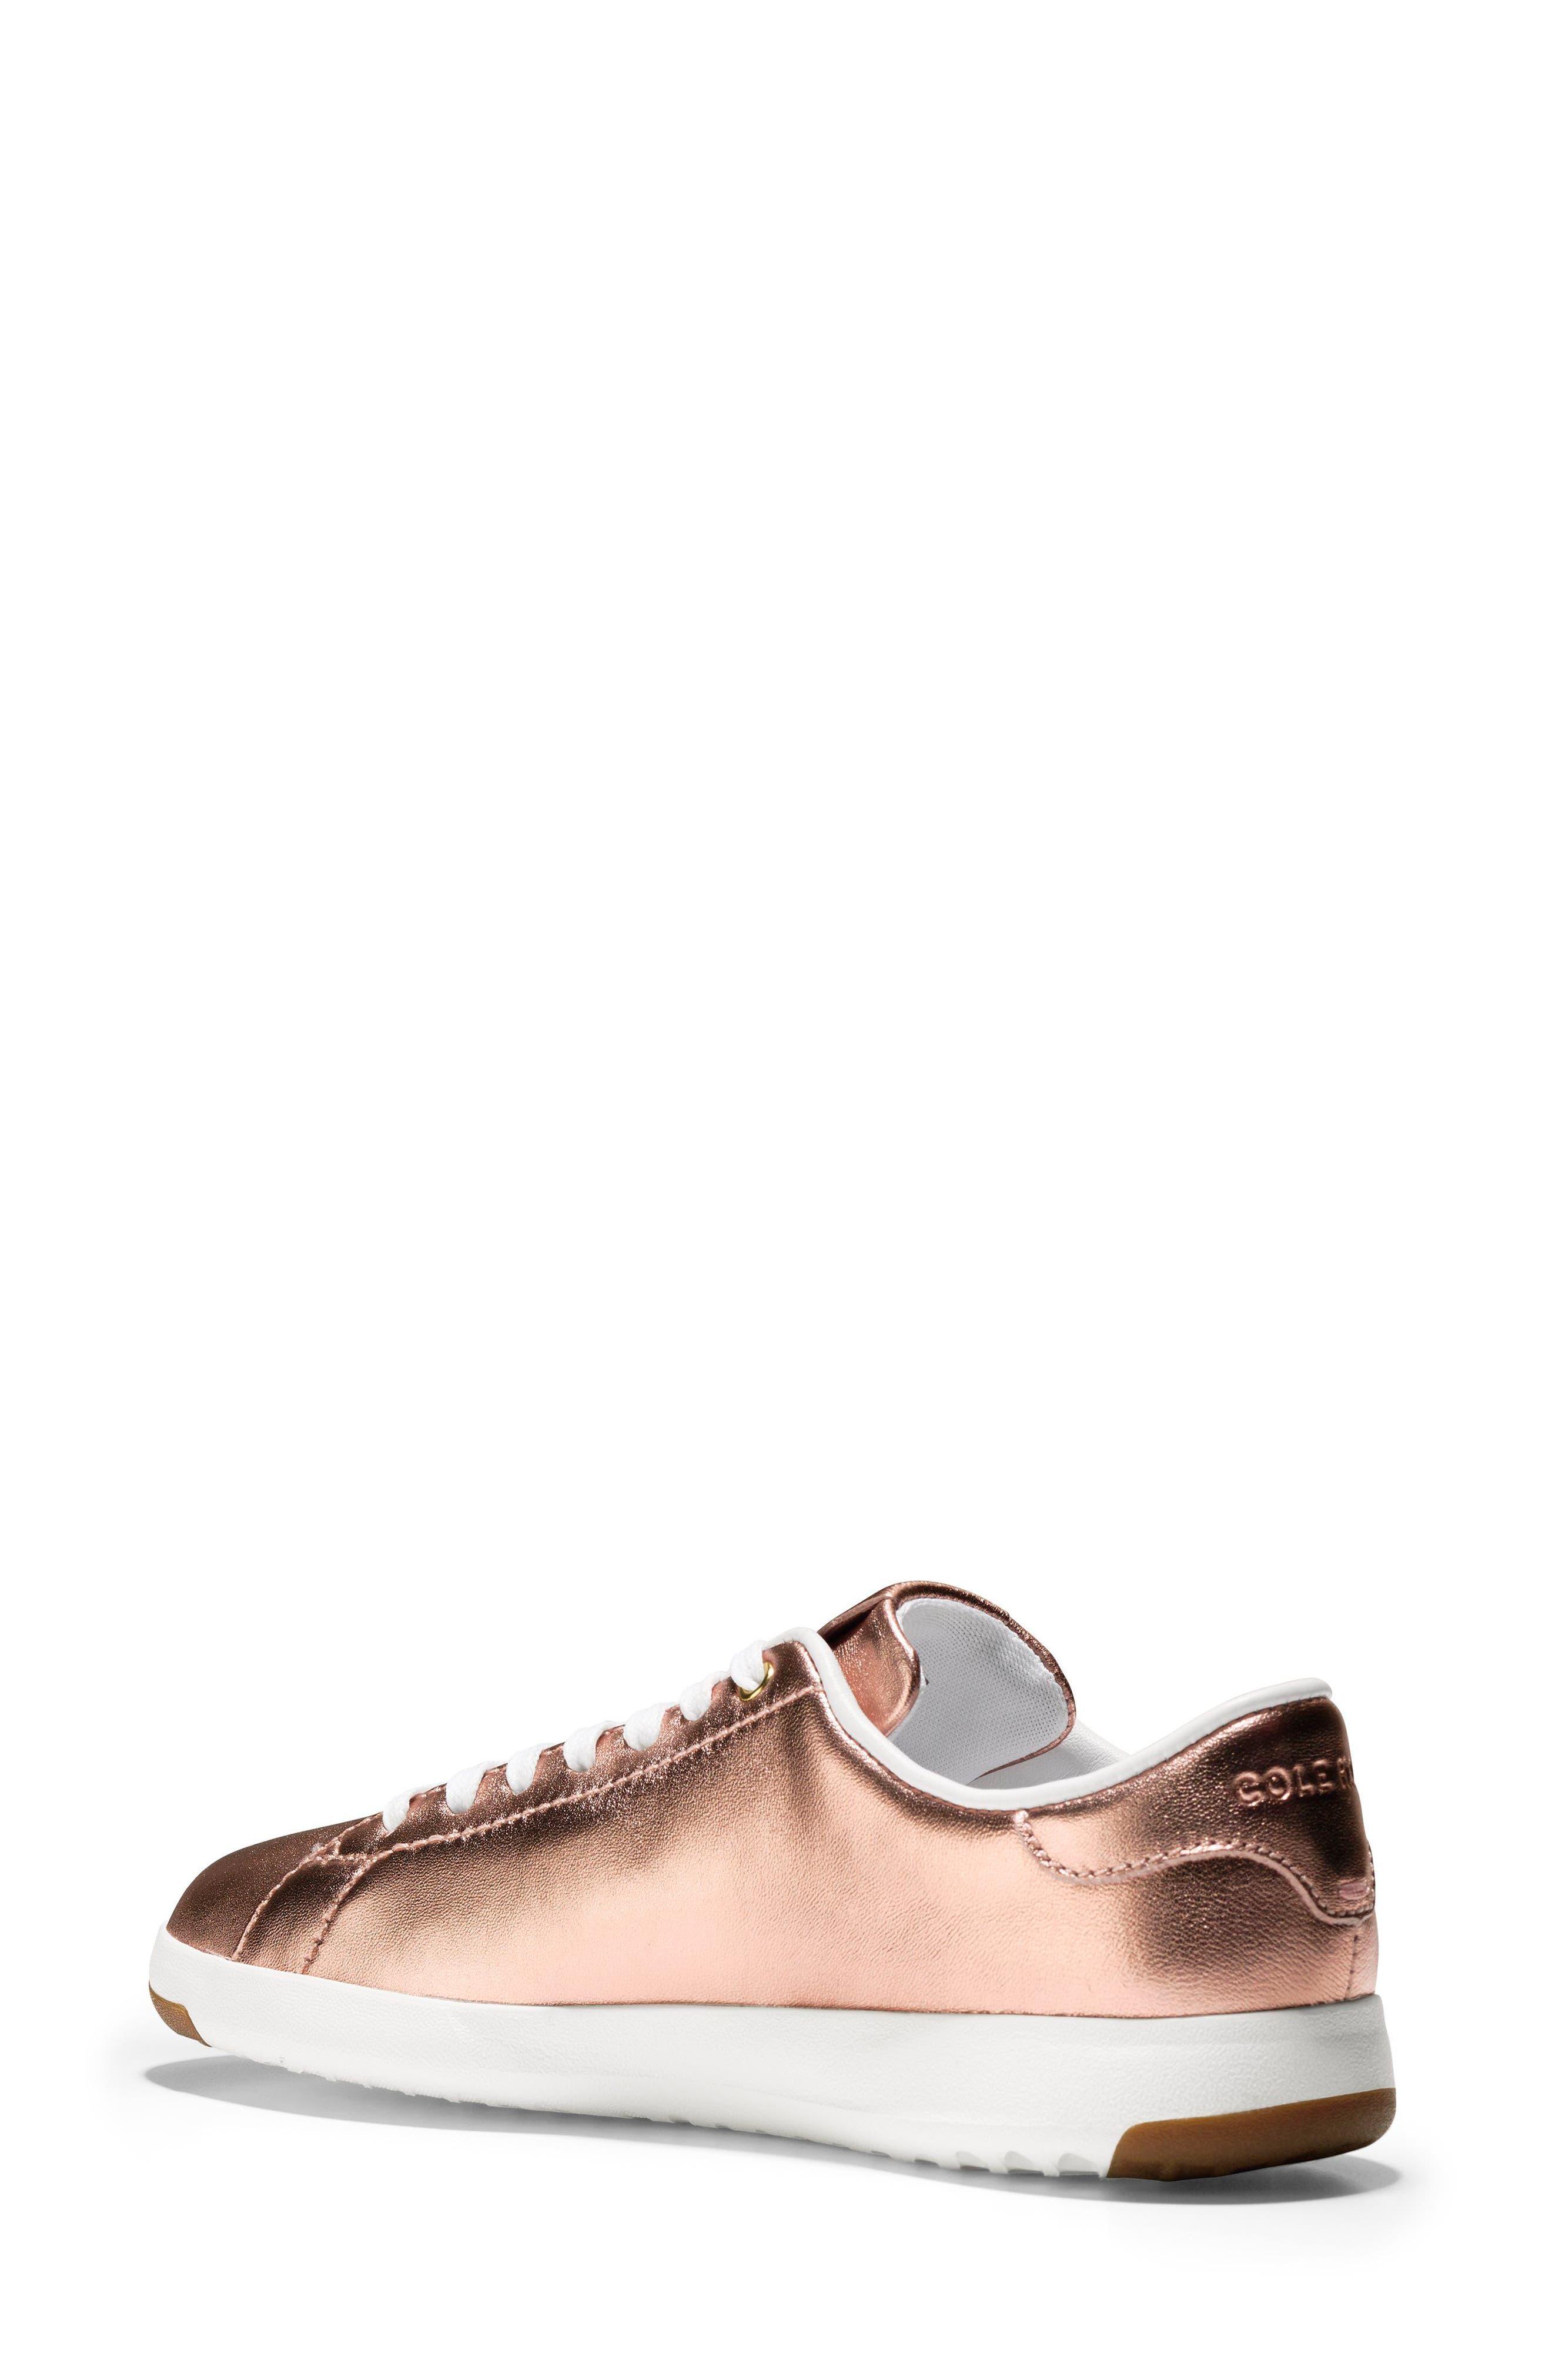 GrandPro Tennis Shoe,                             Alternate thumbnail 2, color,                             Rose Gold Leather